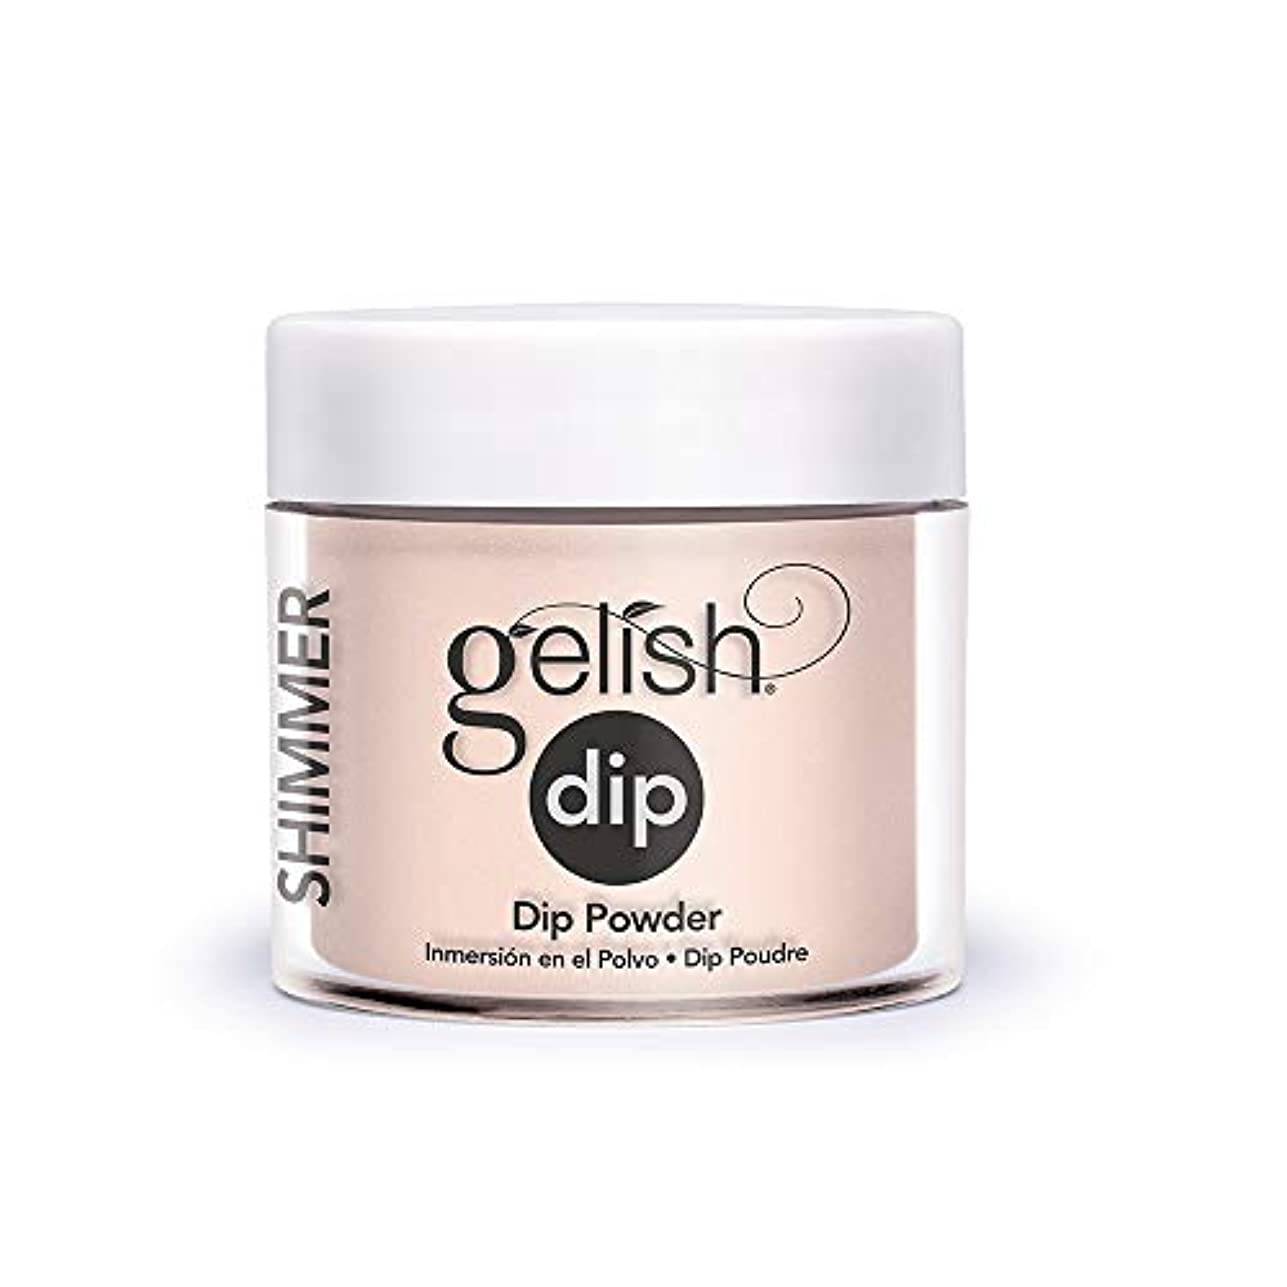 Harmony Gelish - Acrylic Dip Powder - Heaven Sent - 23g / 0.8oz